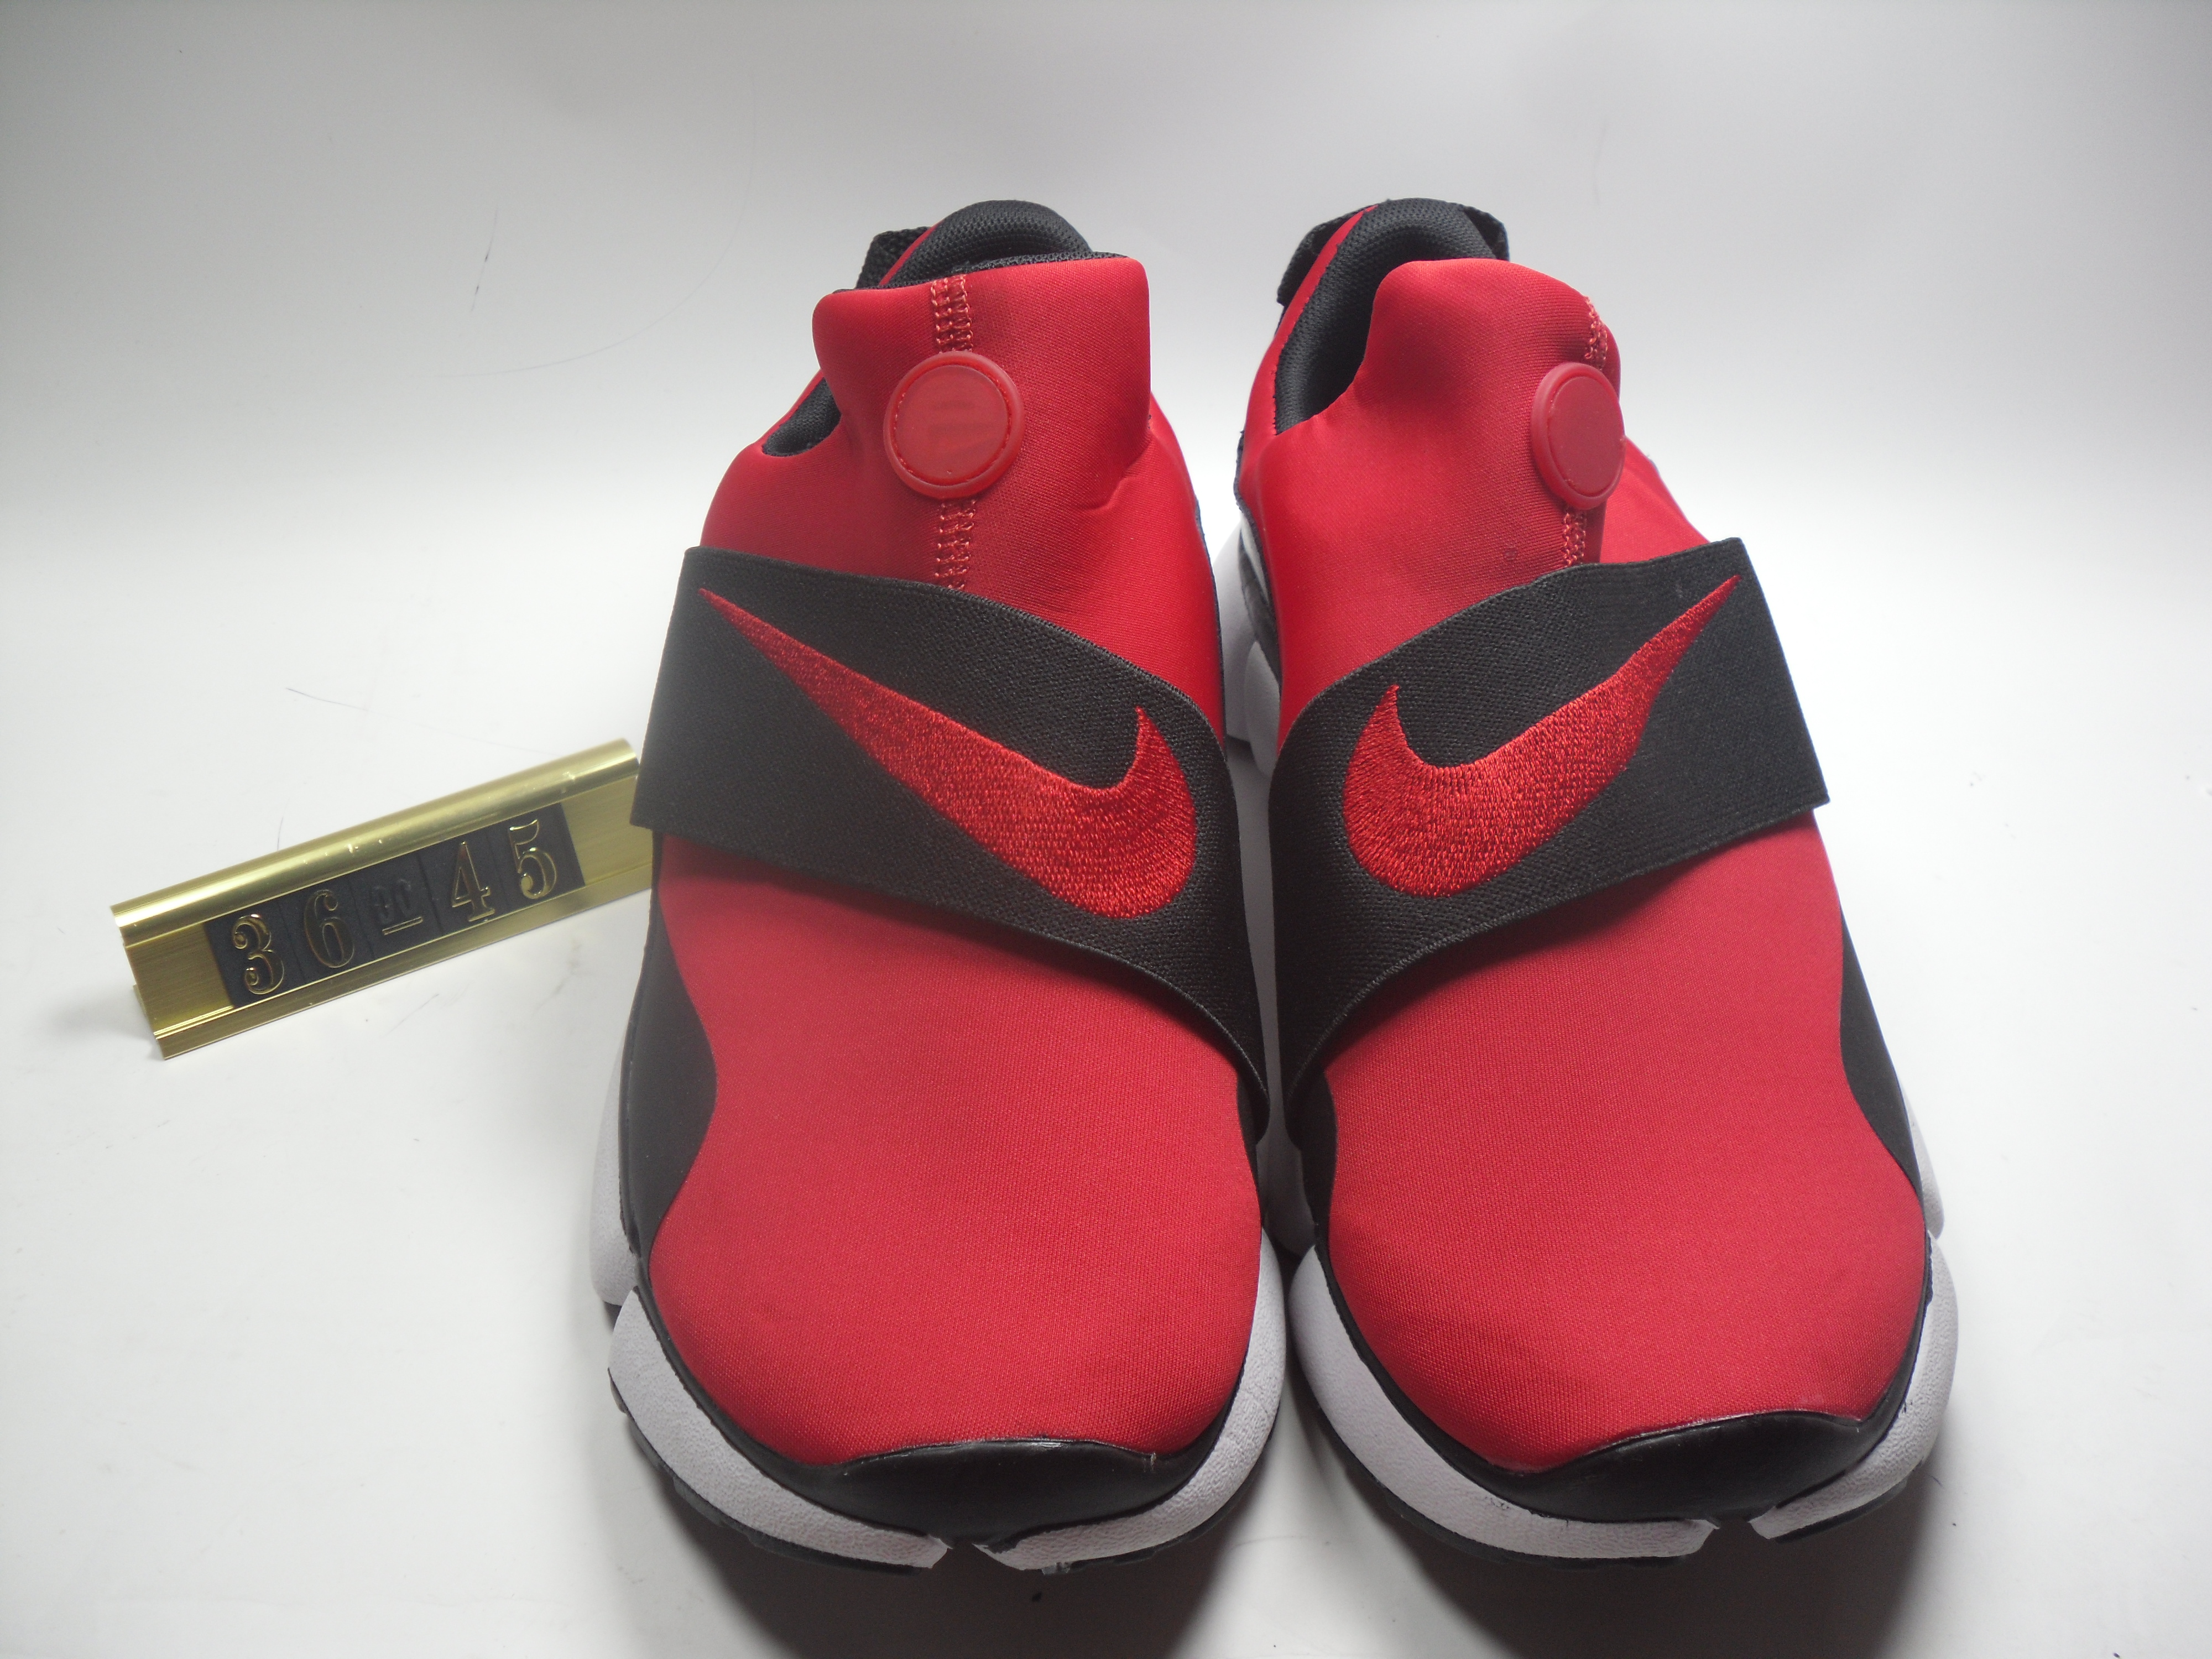 74fd6c604182d Women Nike Air Huarache 5 Red Black Strap Shoes  18running62123 ...